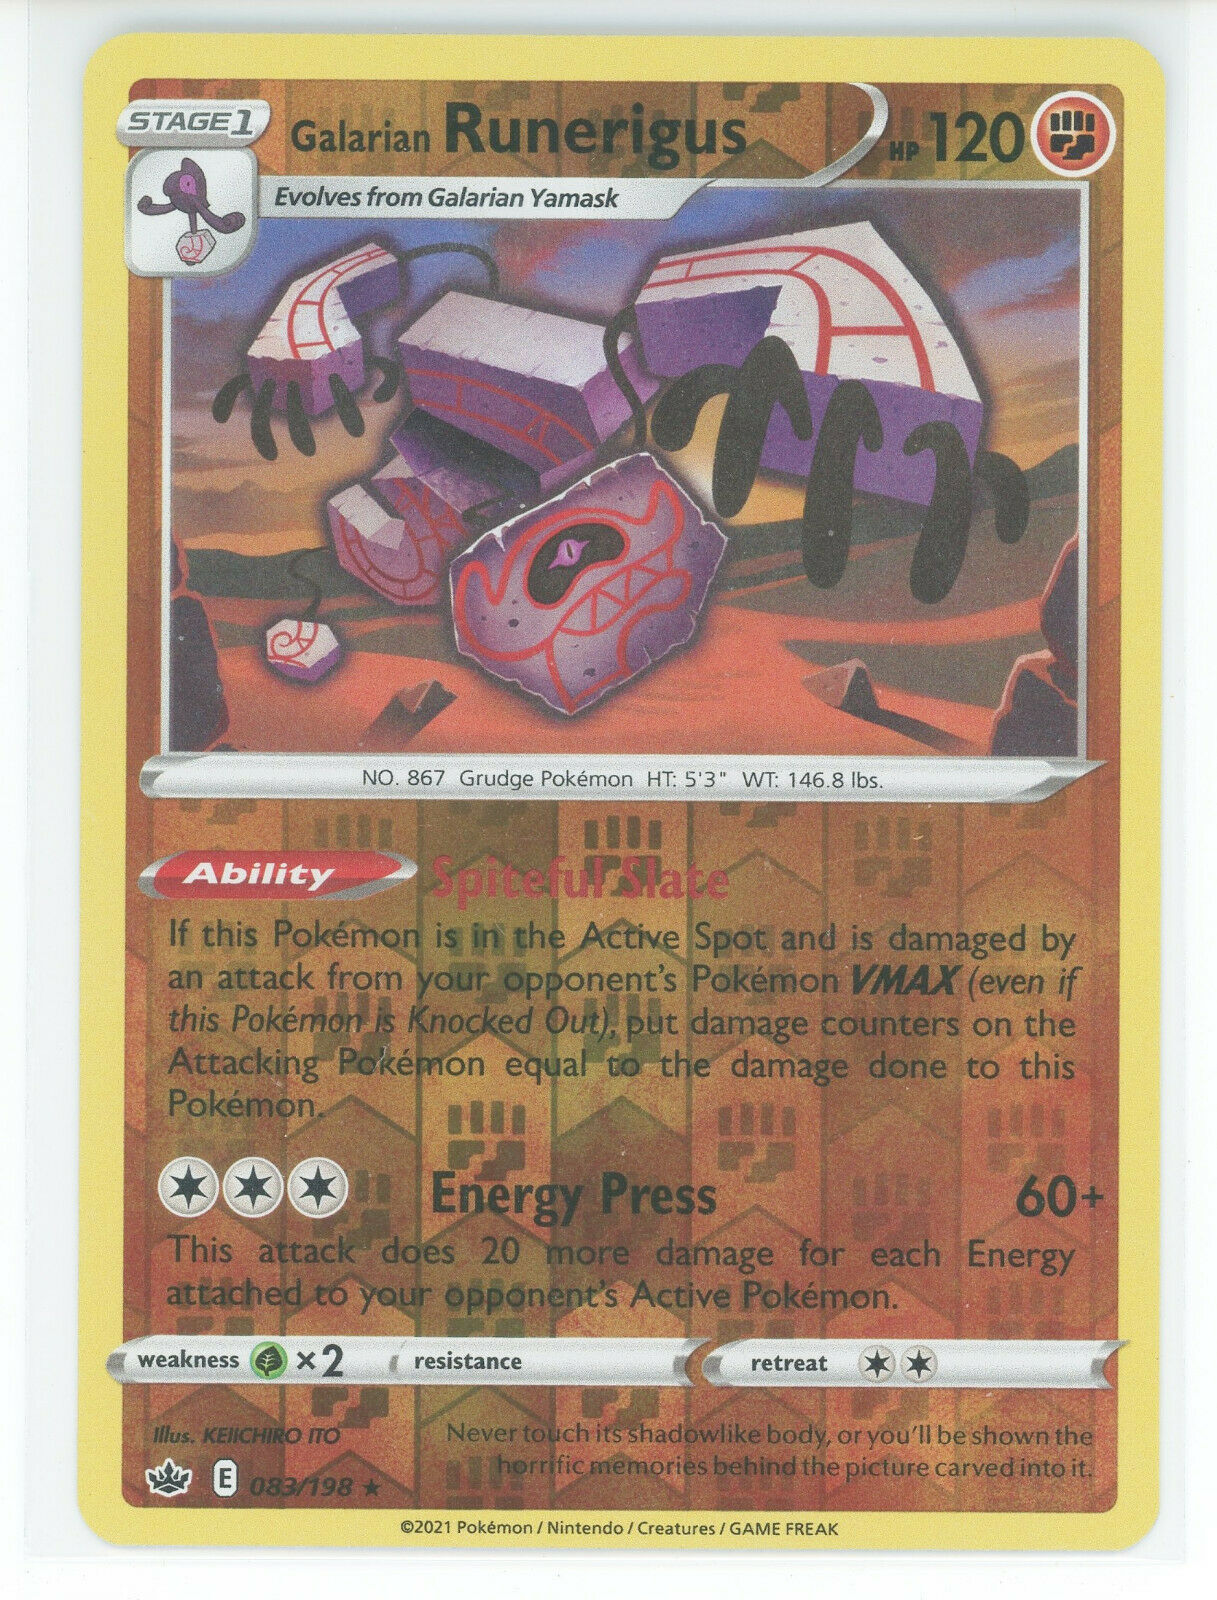 Pokemon 2021 S&S Chilling Reign Galarian Runerigus 083/198 Reverse Holo Rare